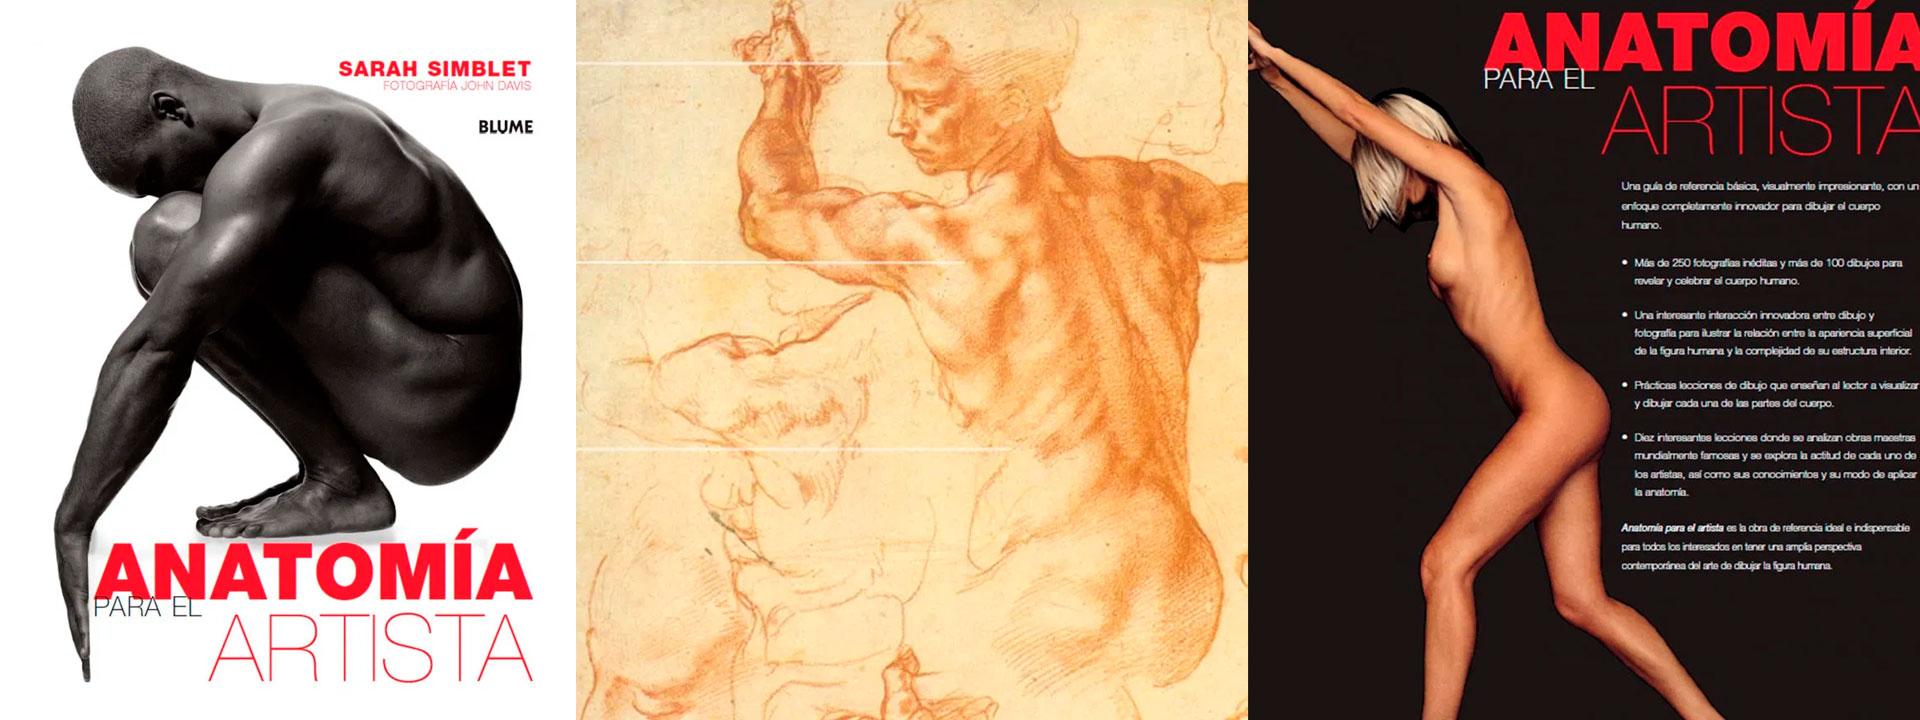 libro dibujo anatomía